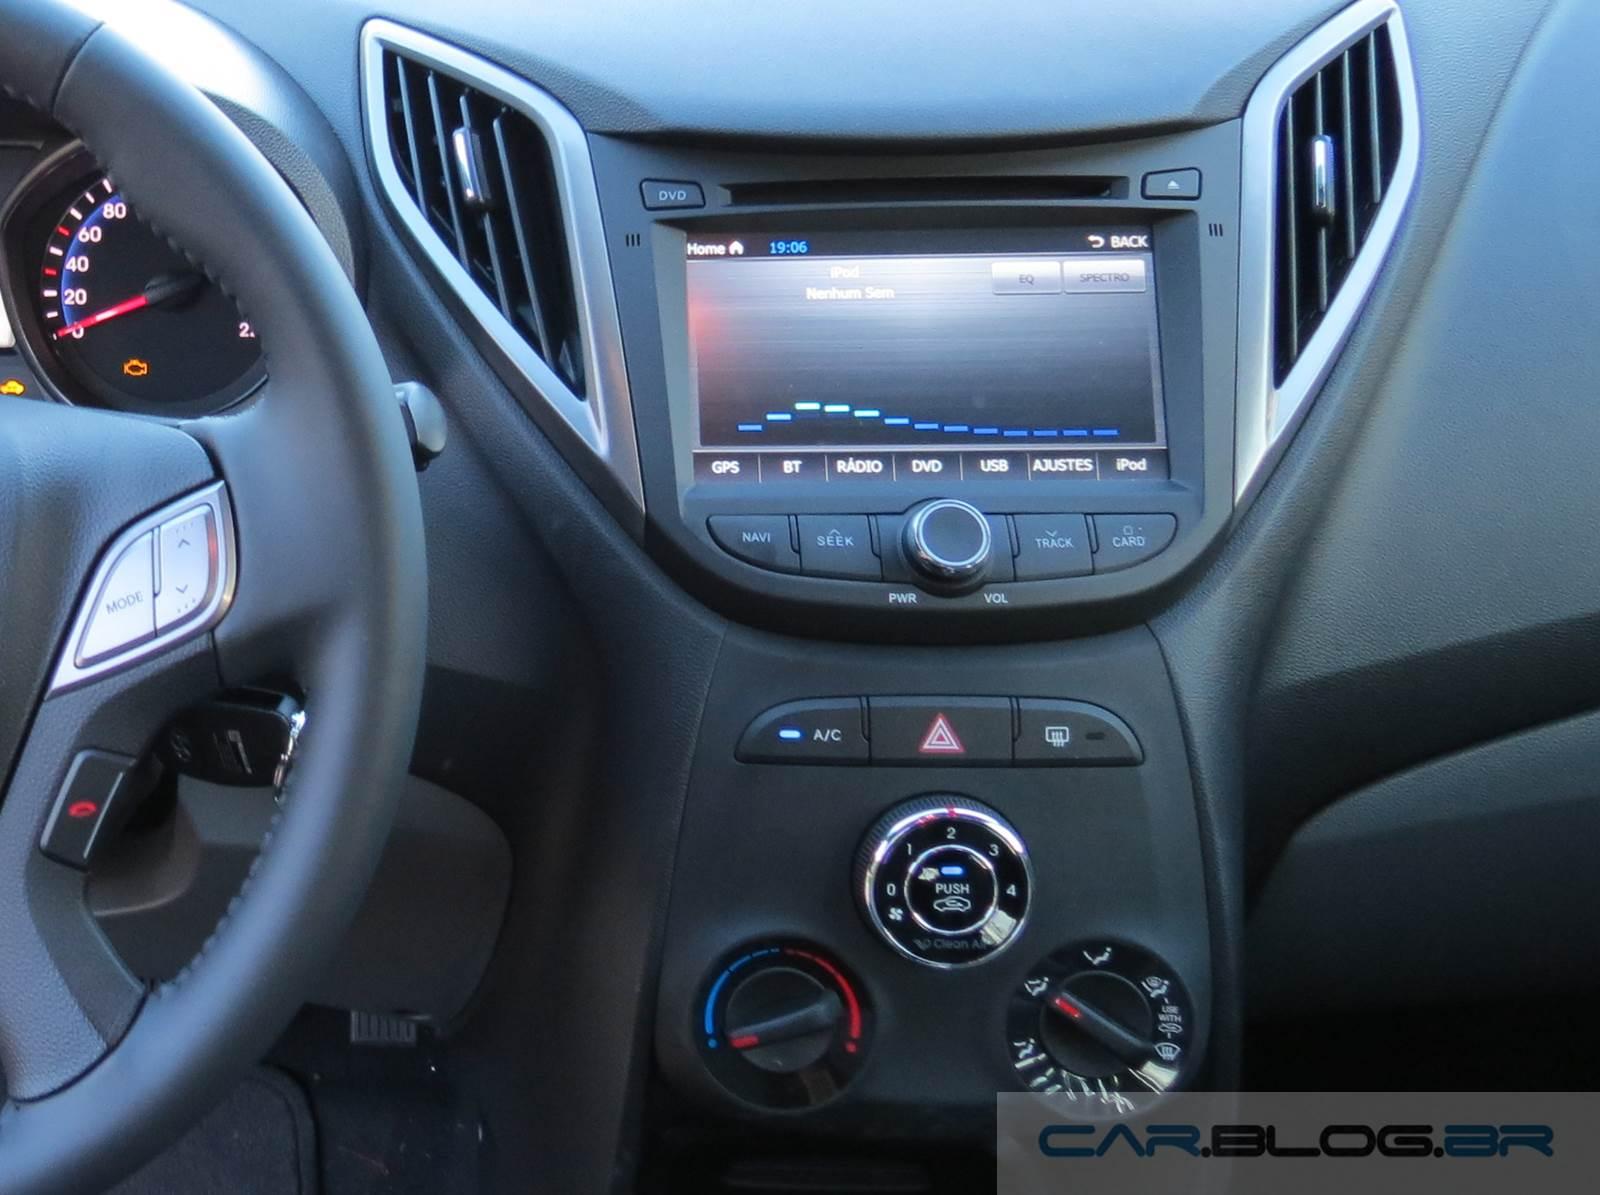 Hyundai HB20 1.6 Automático - interior - central multimídia